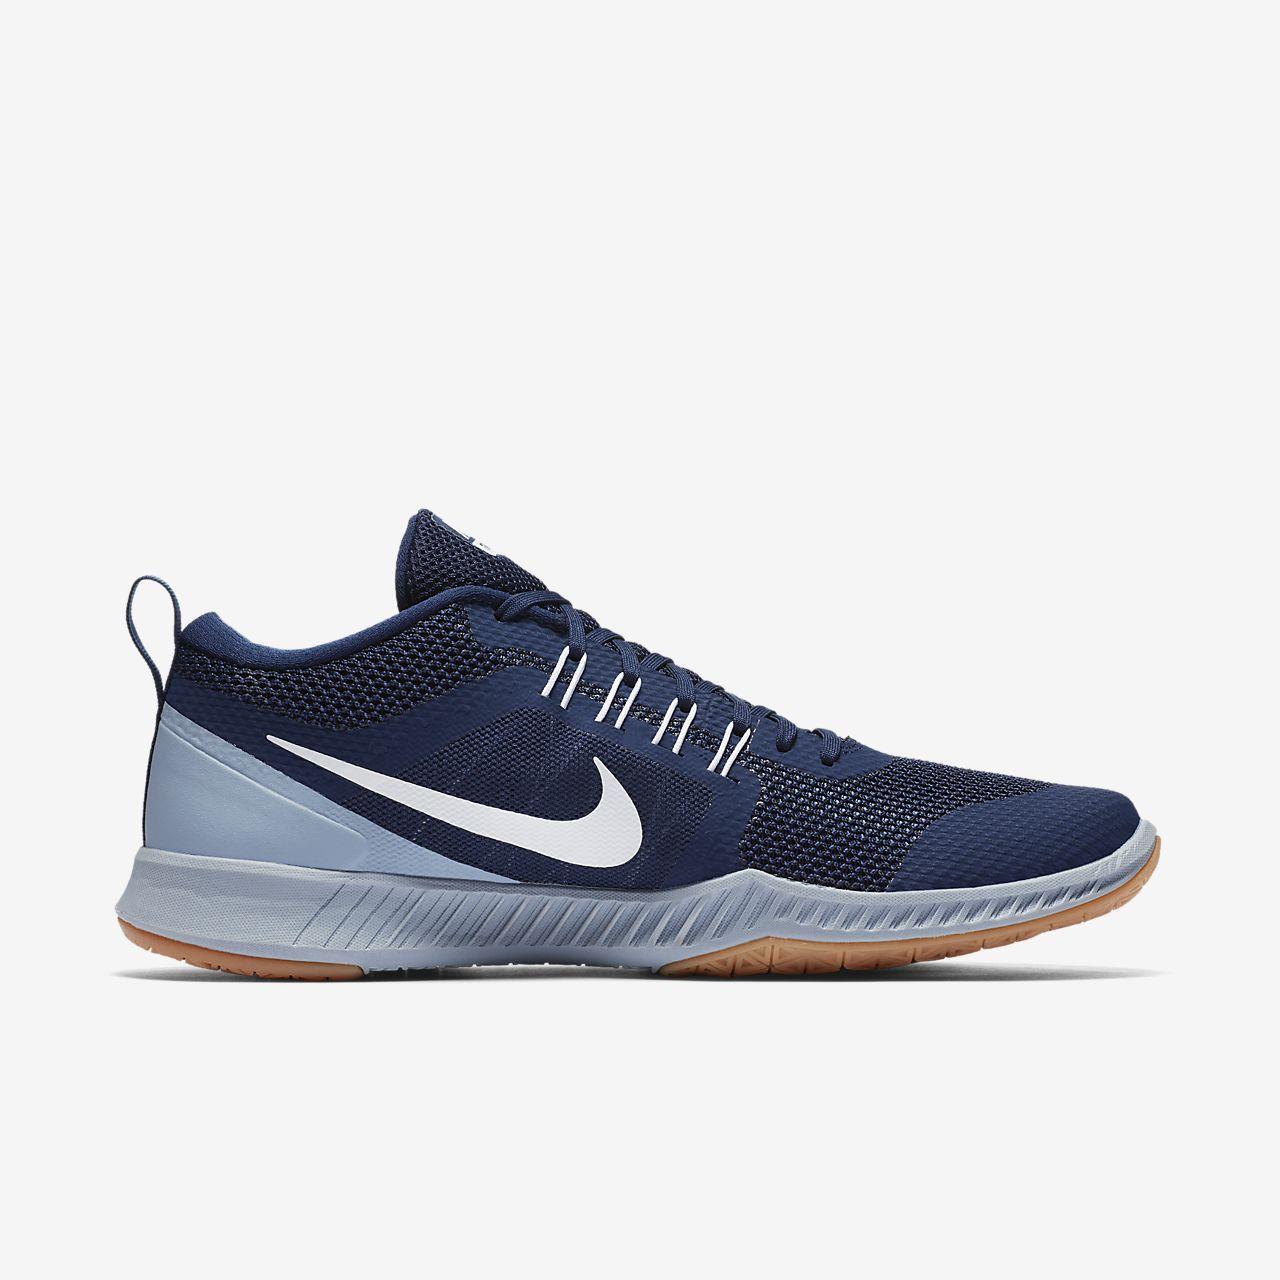 03e1aaafaad6 Nike Zoom Domination Men s Training Shoe. Nike.com AU